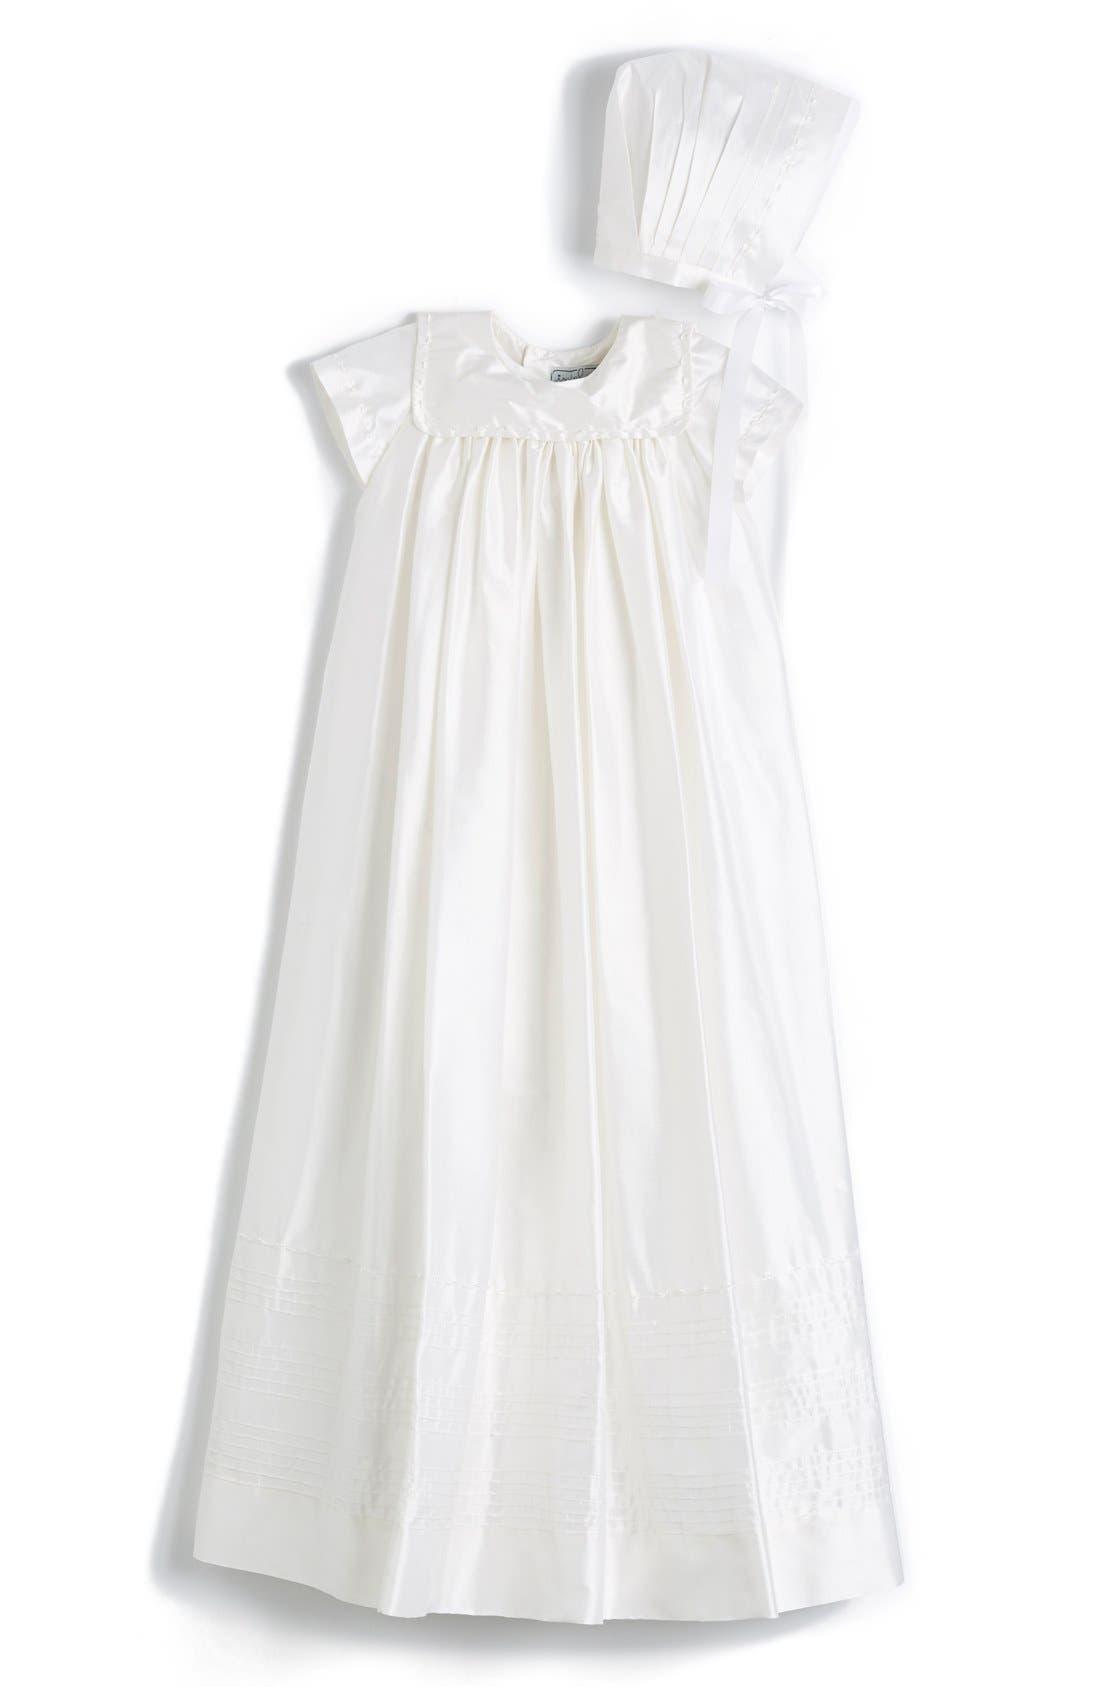 ISABEL GARRETON 'Traditional' Silk Christening Gown & Bonnet